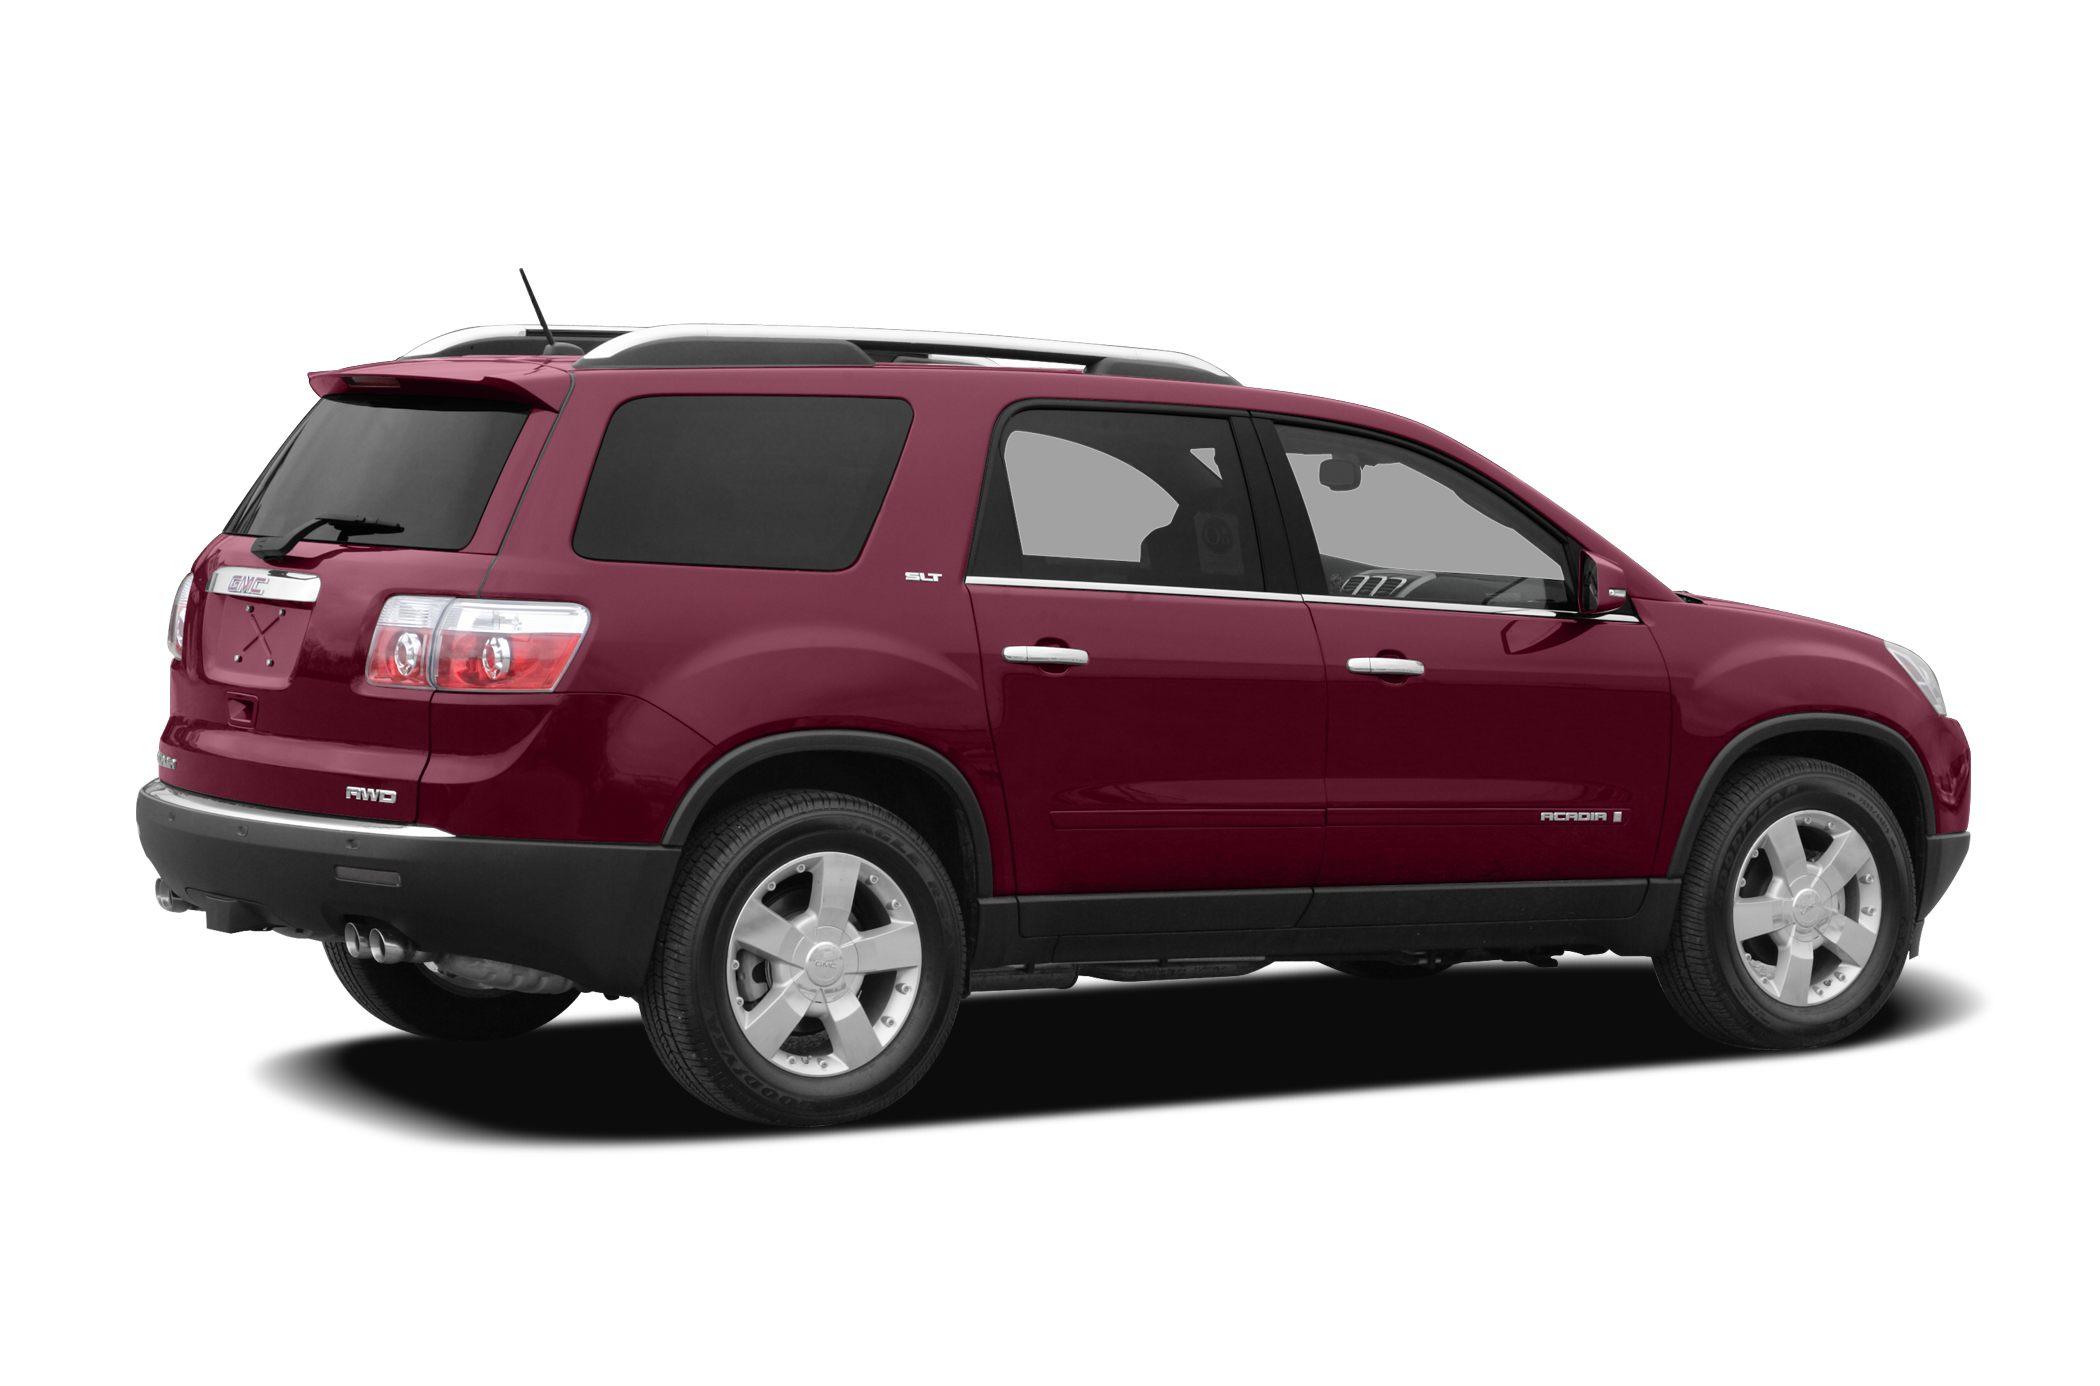 2007 gmc acadia slt cars and vehicles tacoma wa. Black Bedroom Furniture Sets. Home Design Ideas